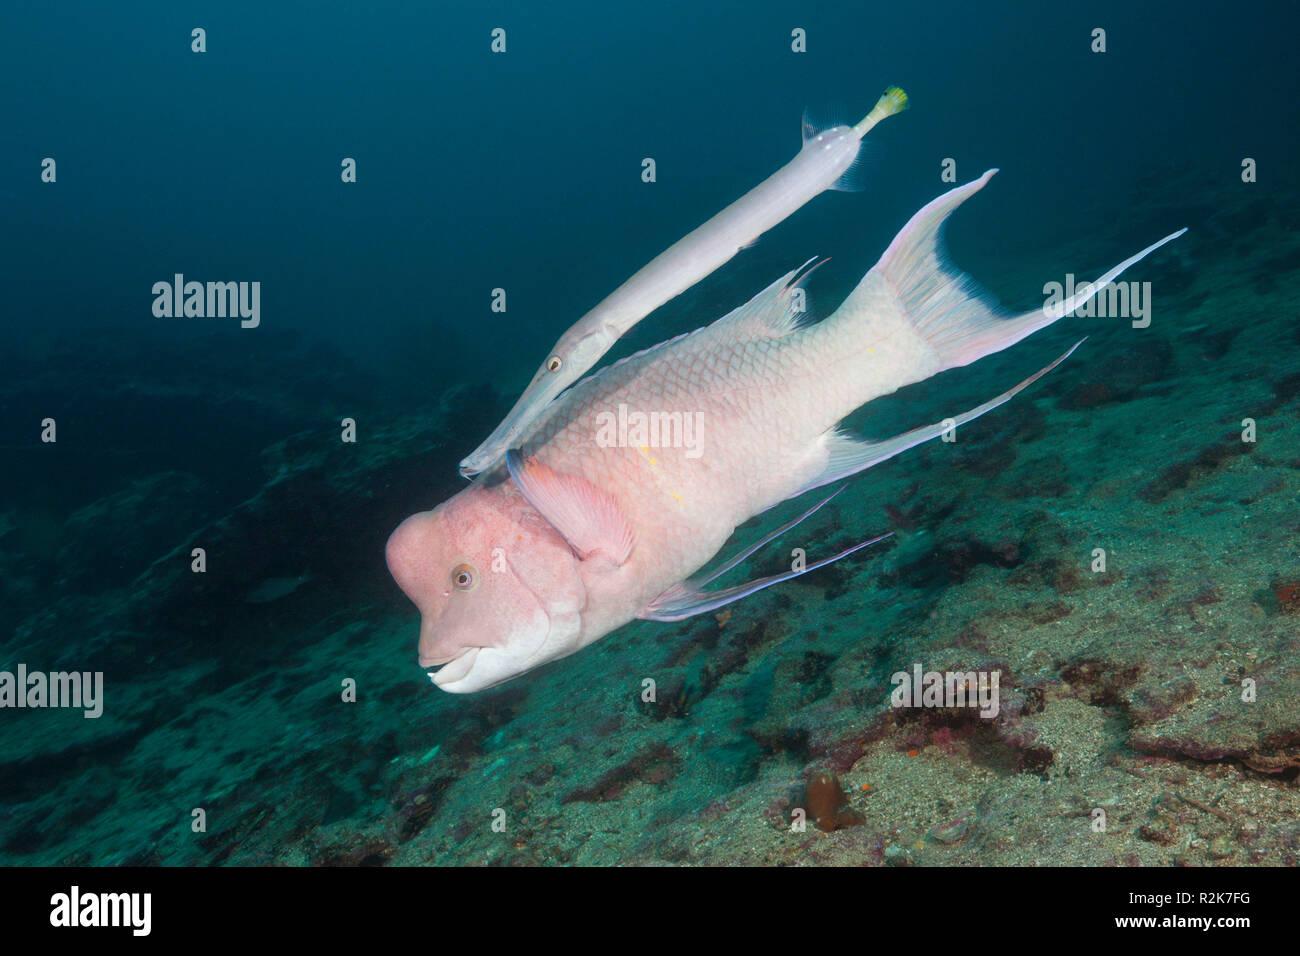 Mexican Hogfish accompanied by Trumpetfish, Bodianus diplotaenia, Cousins Rock, Santiago Island, Galapagos, Ecuador - Stock Image